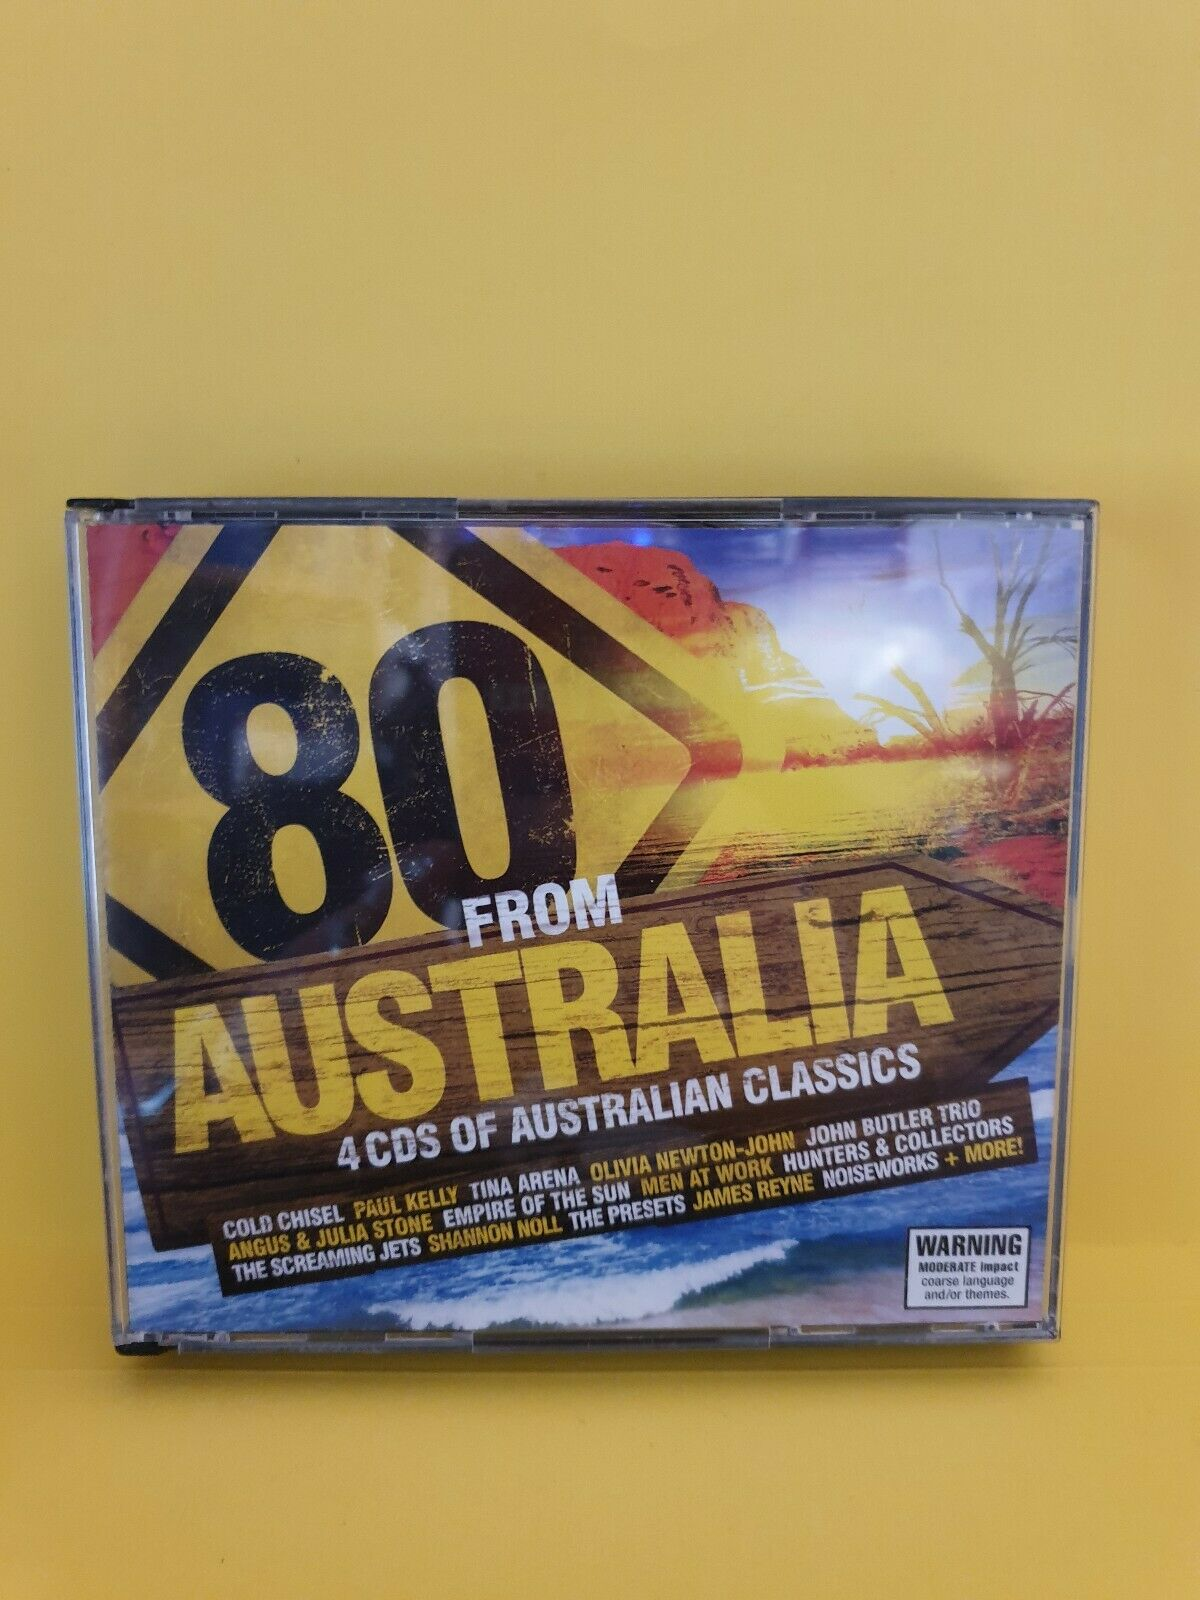 80 From Australia (4 cds) Various Artists 🎵 MUSIC CD